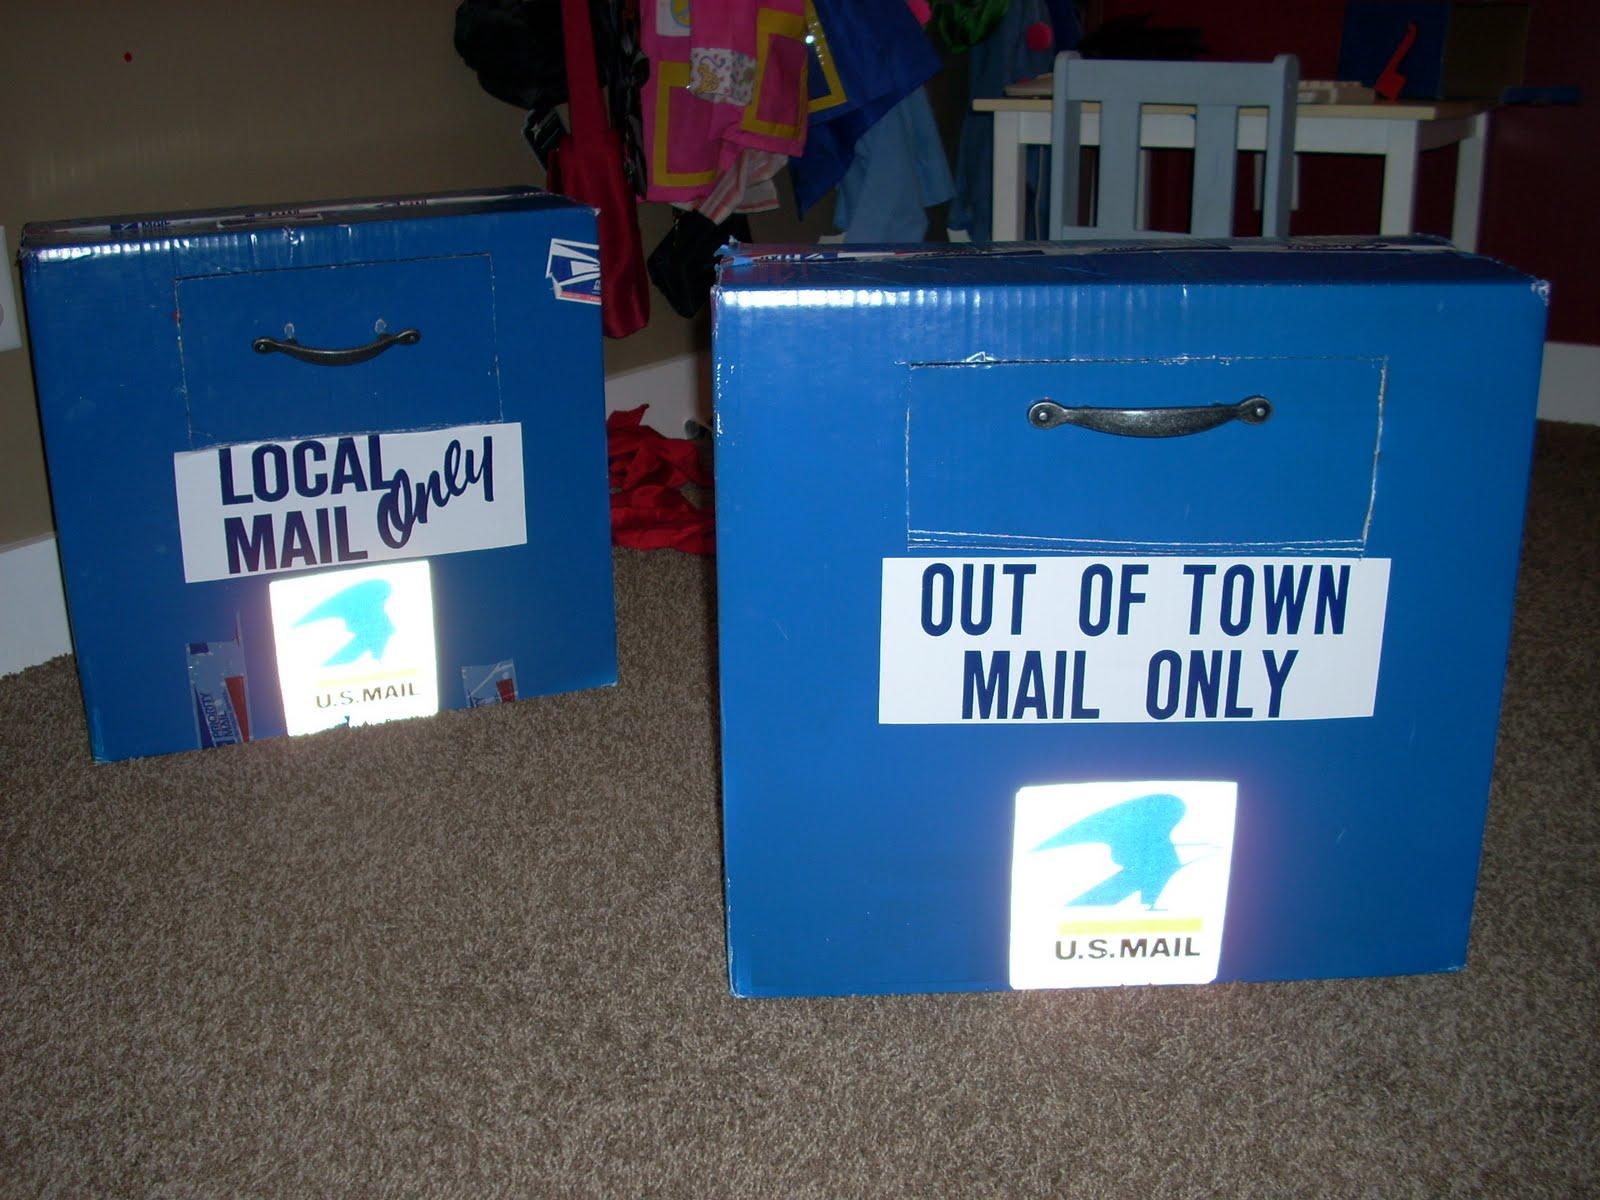 preschool mailbox laguna preschool curriculum post office imaginary play 165